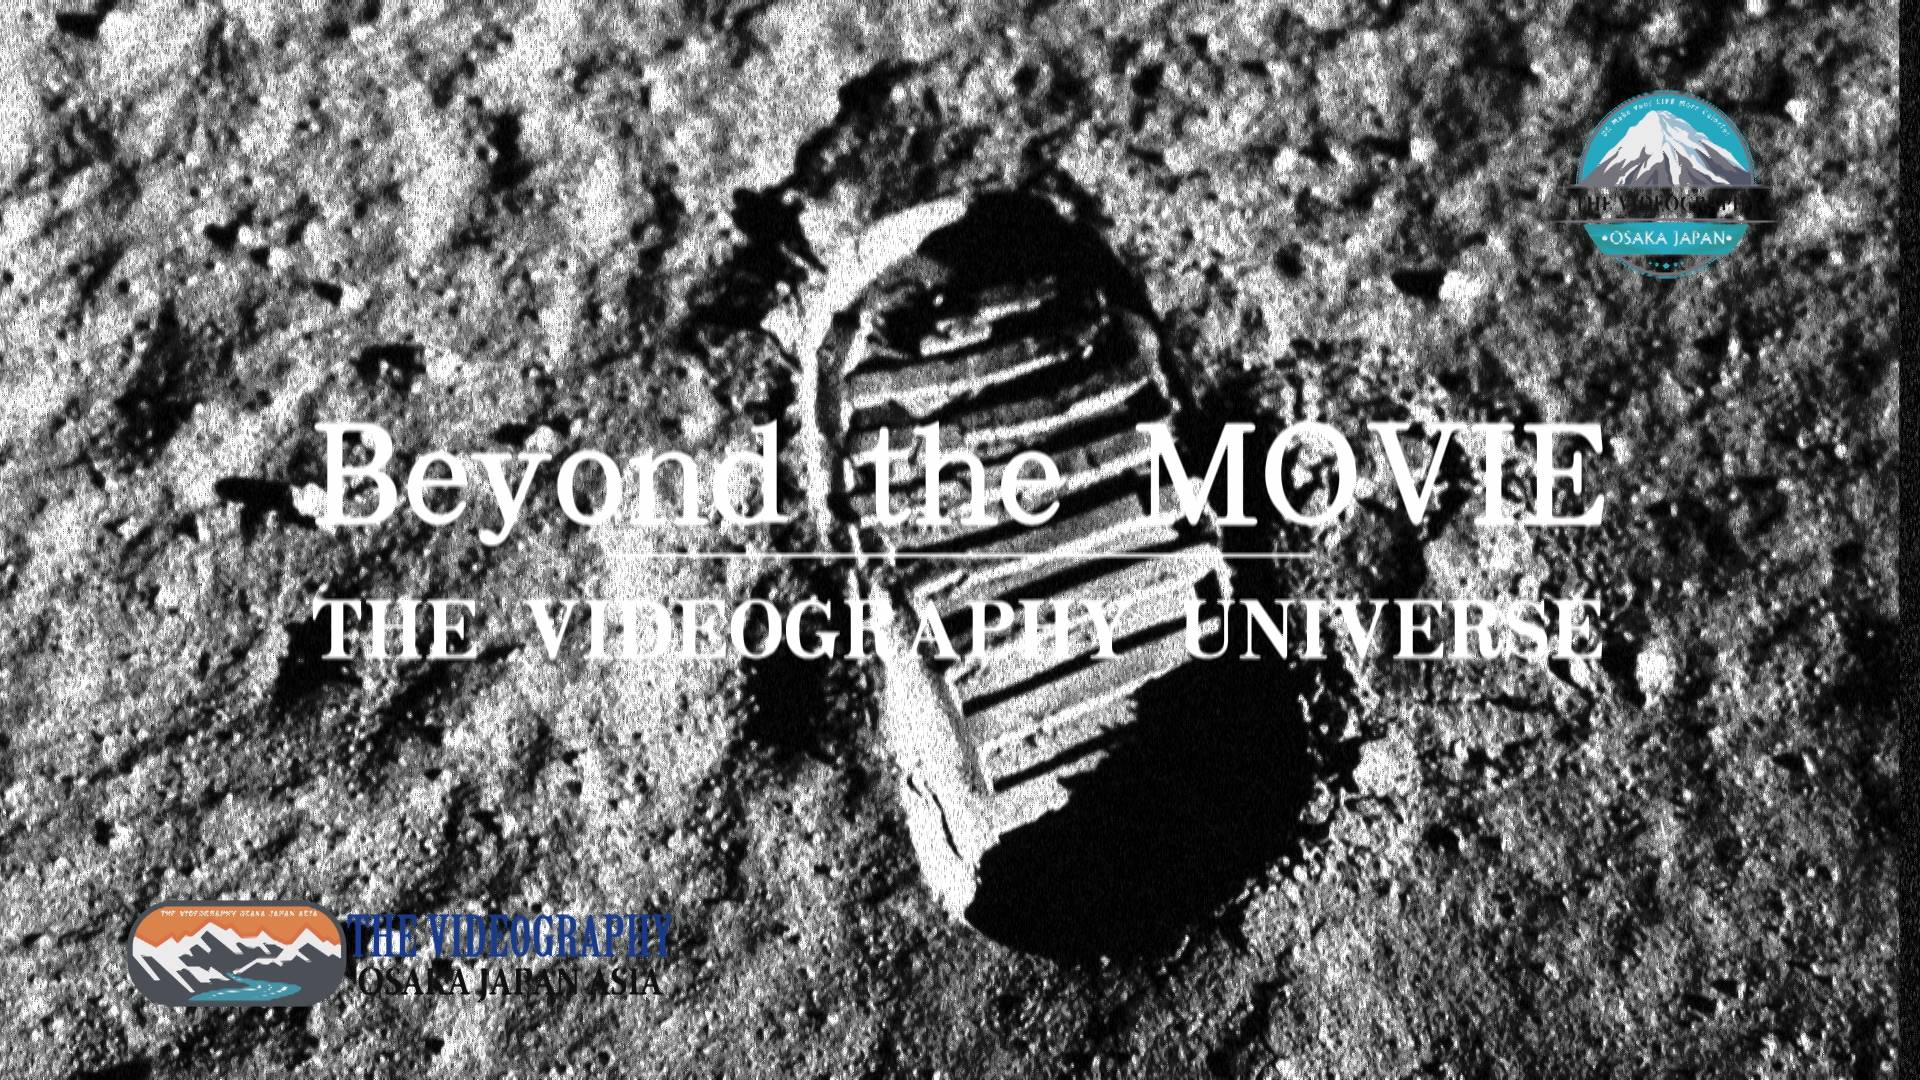 Dear Universe. Meet Universe with VG. 宇宙遊泳 月面旅行@ビデオグラフィ プロモーションムービー・PV制作・映像制作・動画編集。 Universe of possibilities・圧倒的な美しさのプロモーションビデオ / PR動画。映像上で、一足お先に宇宙旅行 宇宙遊泳 銀河系探索へ行きませんか。21世紀のゴールドラッシュ・人類最後のフロンティア。誰が最初に栄光をつかむのか。Who win the first prize? Who wanna be the first private astronaut? さあ、始まりました!! Meet Universe Movie Project. あなたの夢を叶えます。PVとして動画上で、夢の月面旅行 宇宙遊泳や銀河系の探索が可能